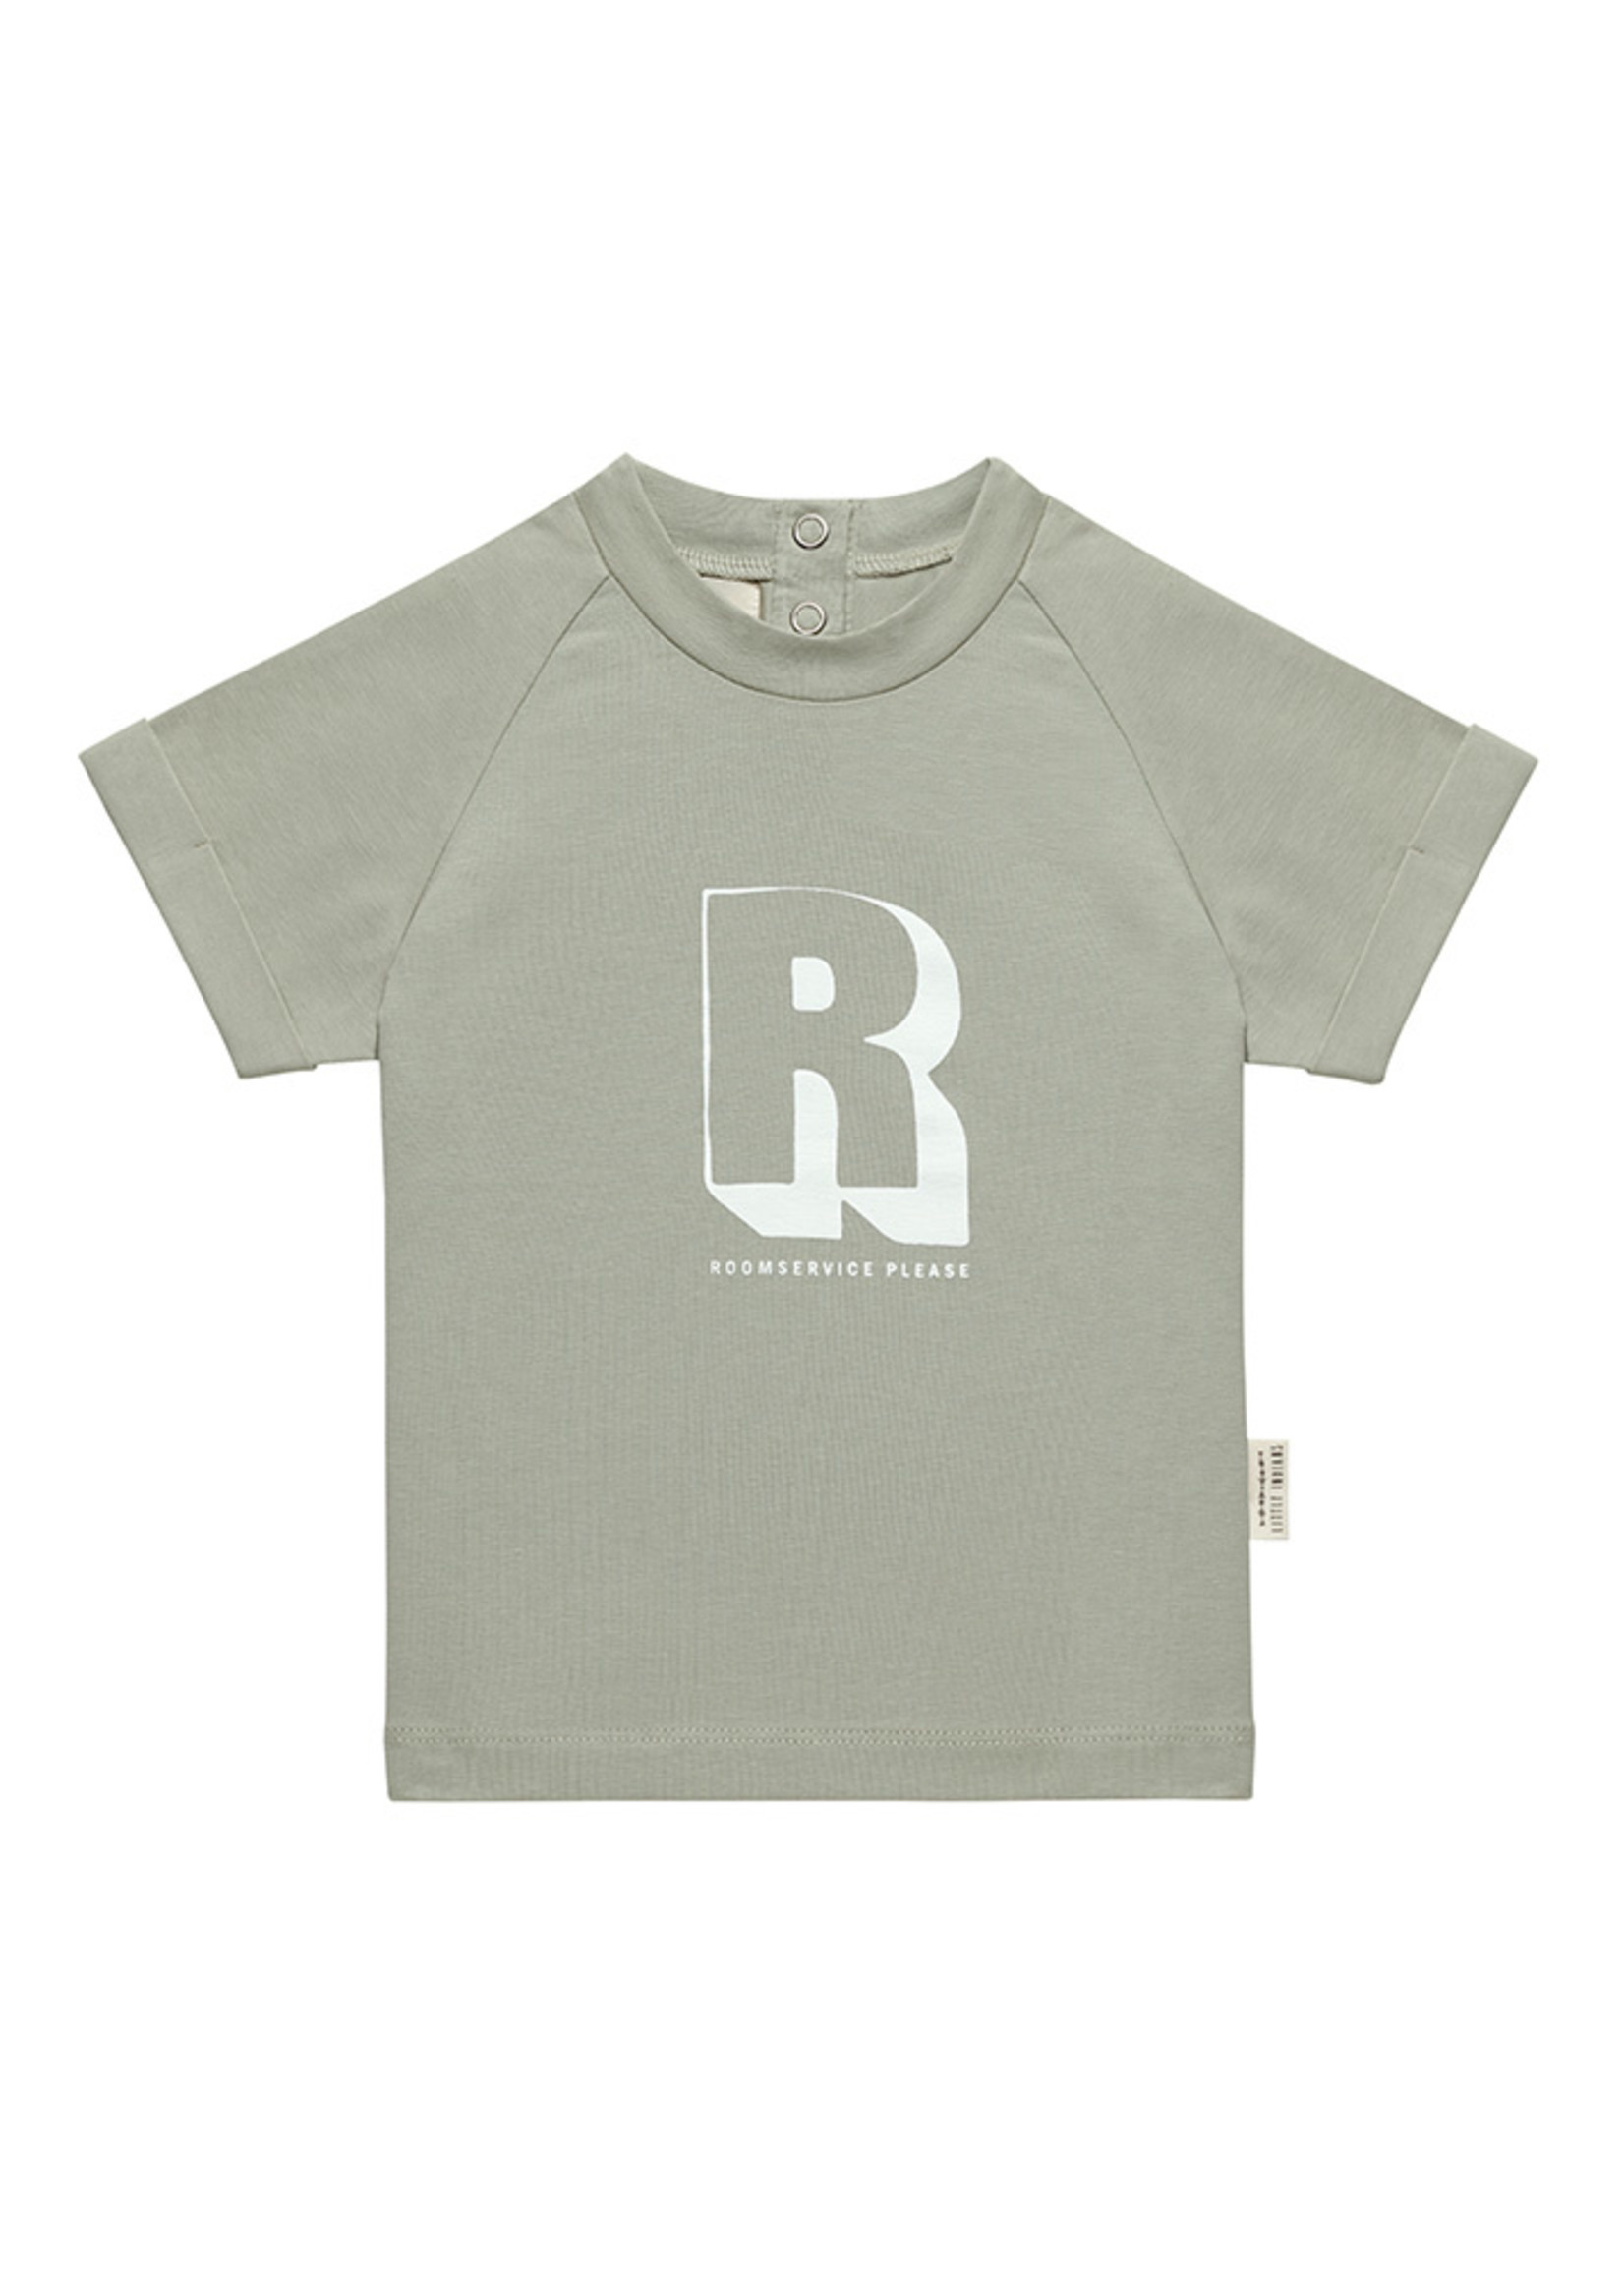 Little Indians LI - Tshirt Roomservice Abbey Stone